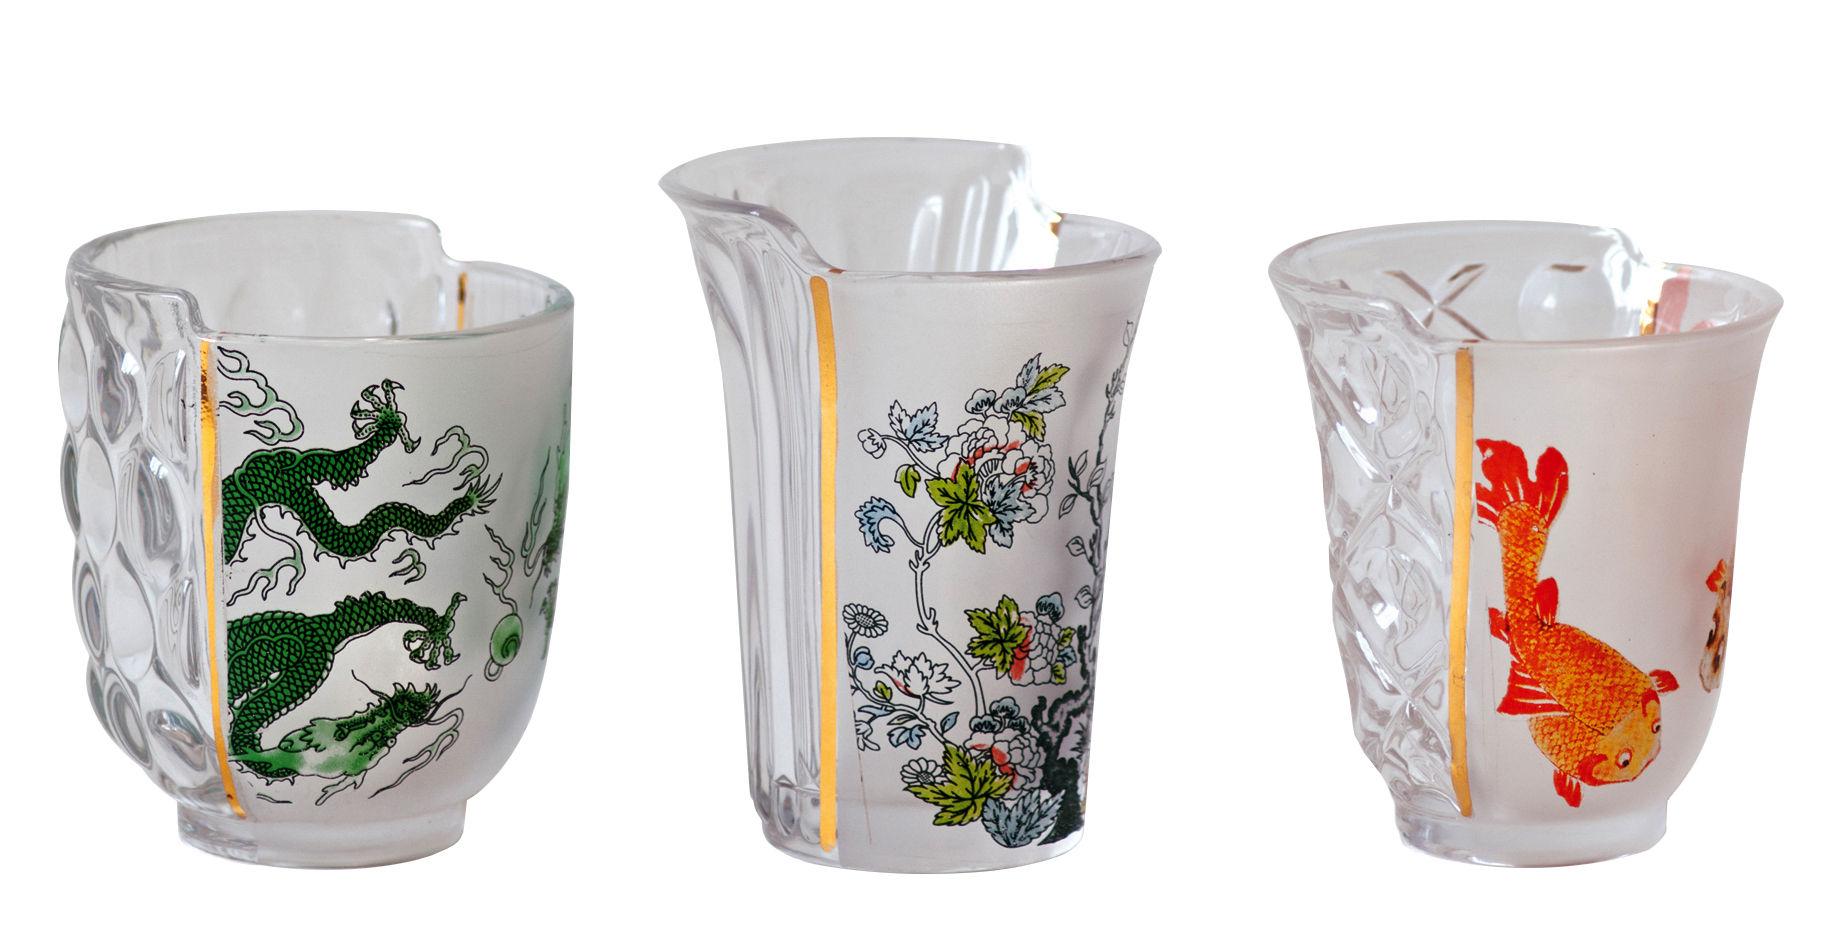 Tischkultur - Gläser - Hybrid Aglaura Glas / 3er-Set - Seletti - Mehrfarbig - Glas